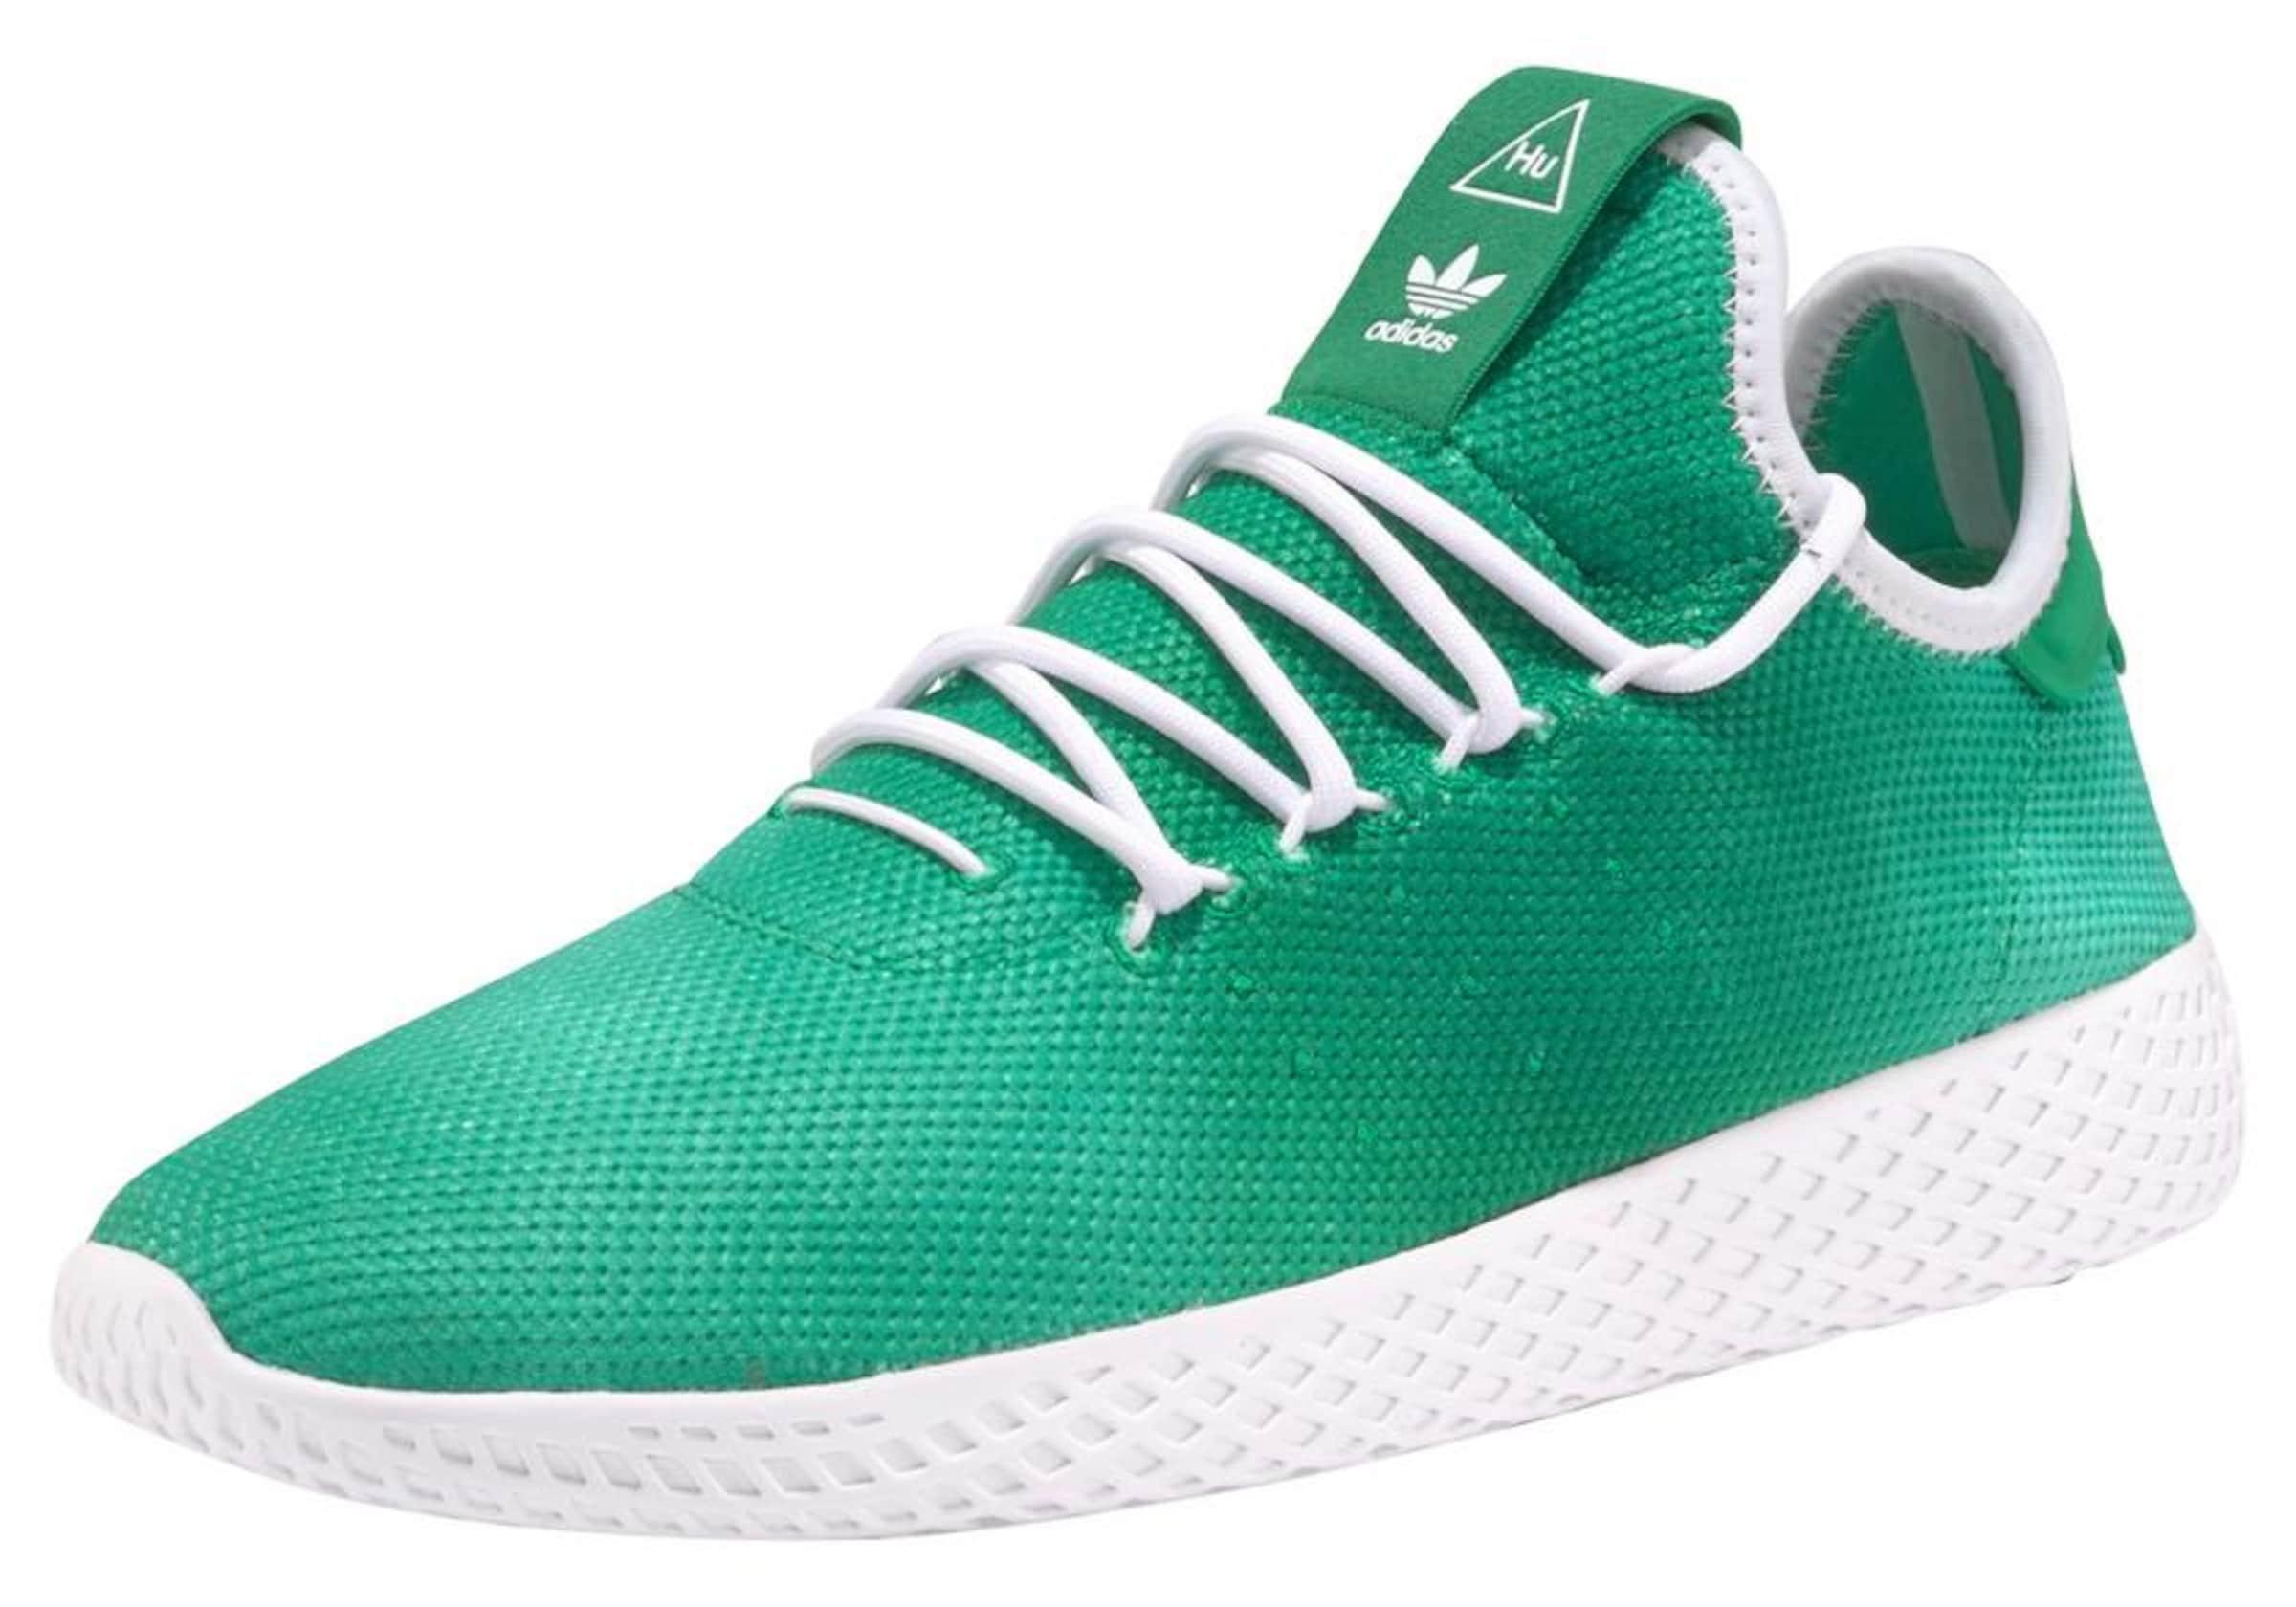 ADIDAS Holi ORIGINALS Sneaker PW HU Holi ADIDAS Tennis 1fe505